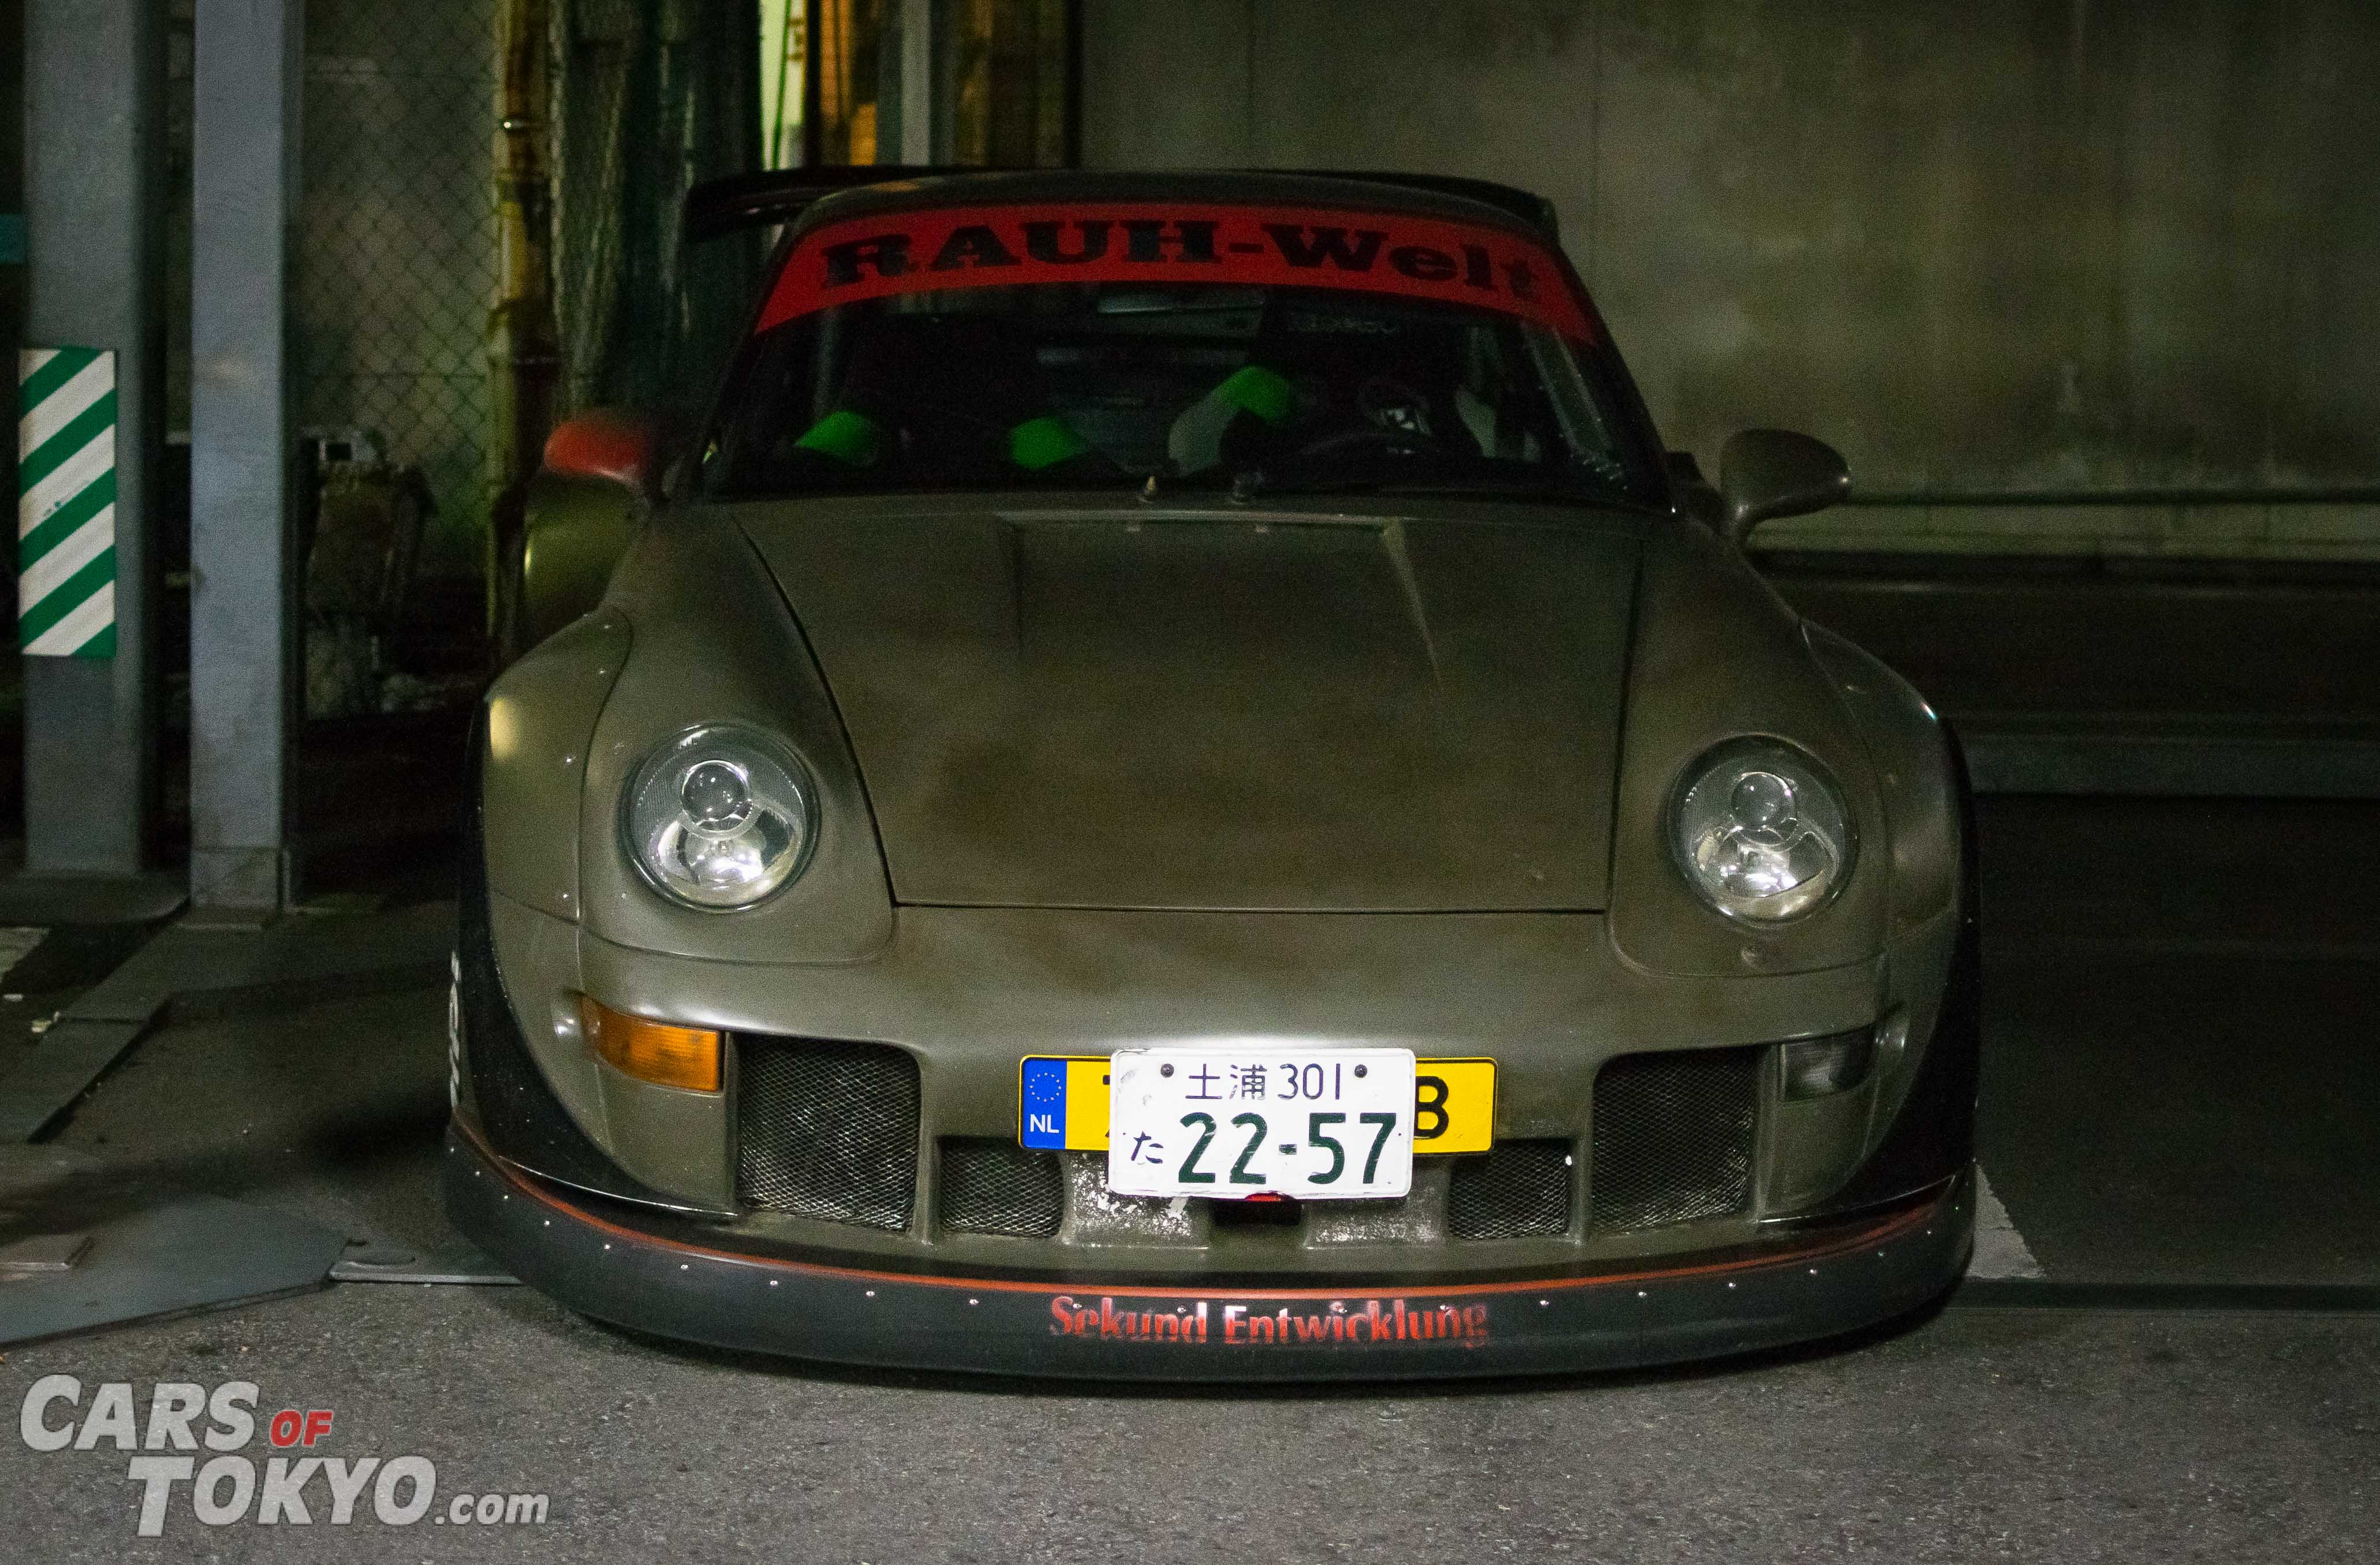 Cars of Tokyo RWB Porsche 911 Camo